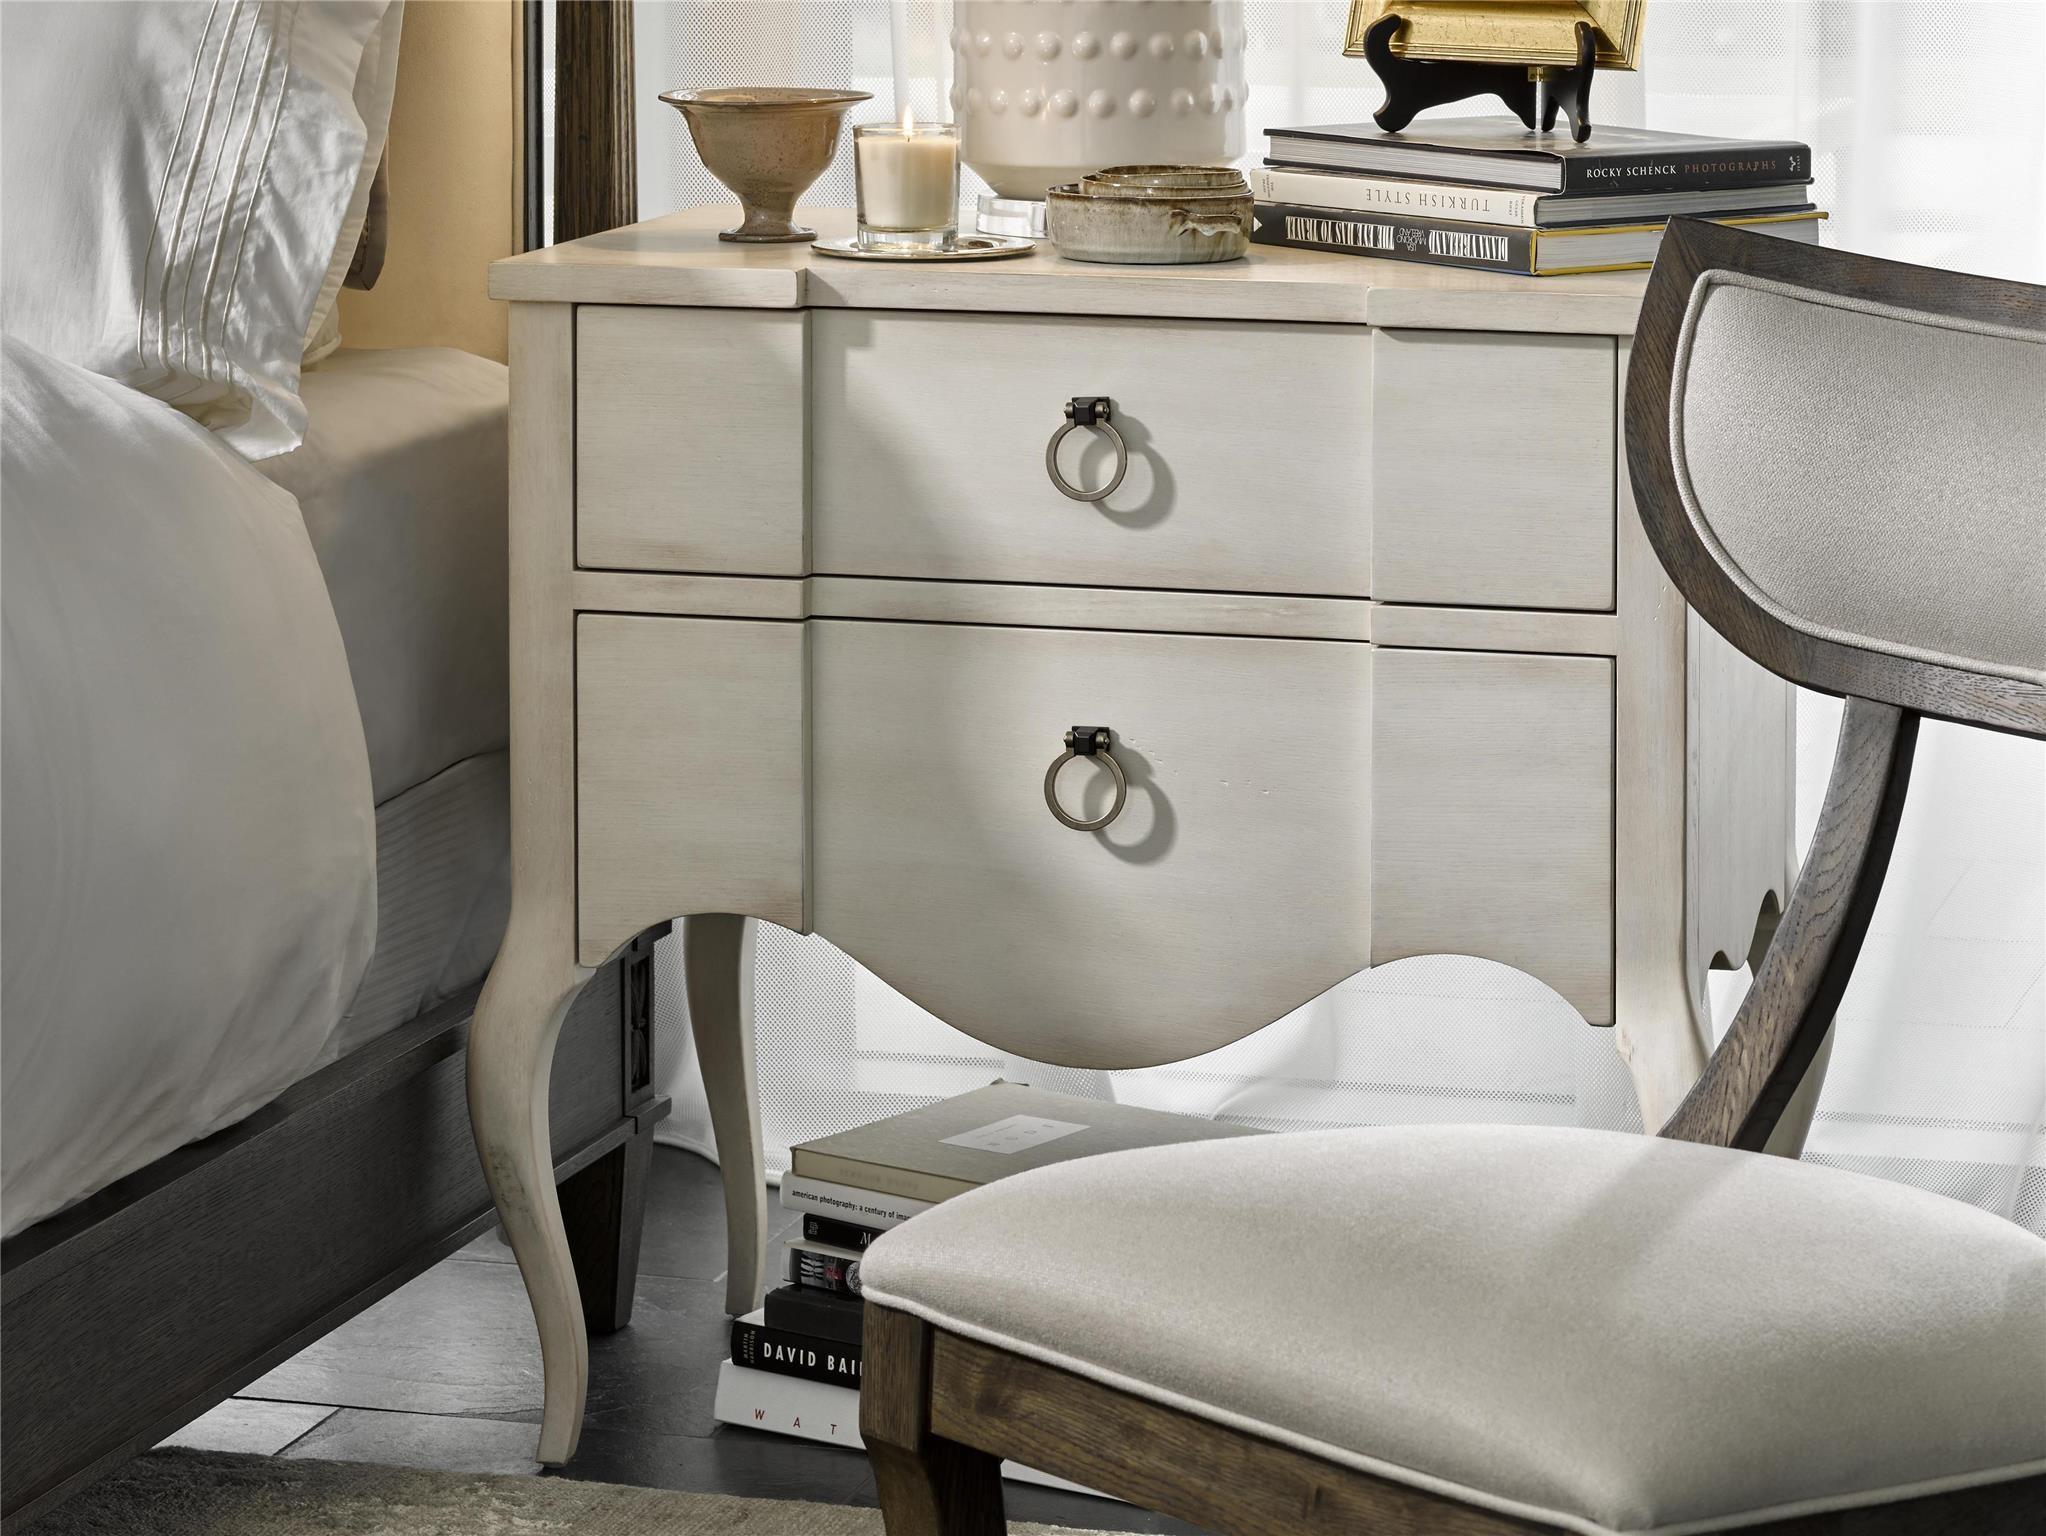 Fine Furniture Design Sadie Night Table 1581 100